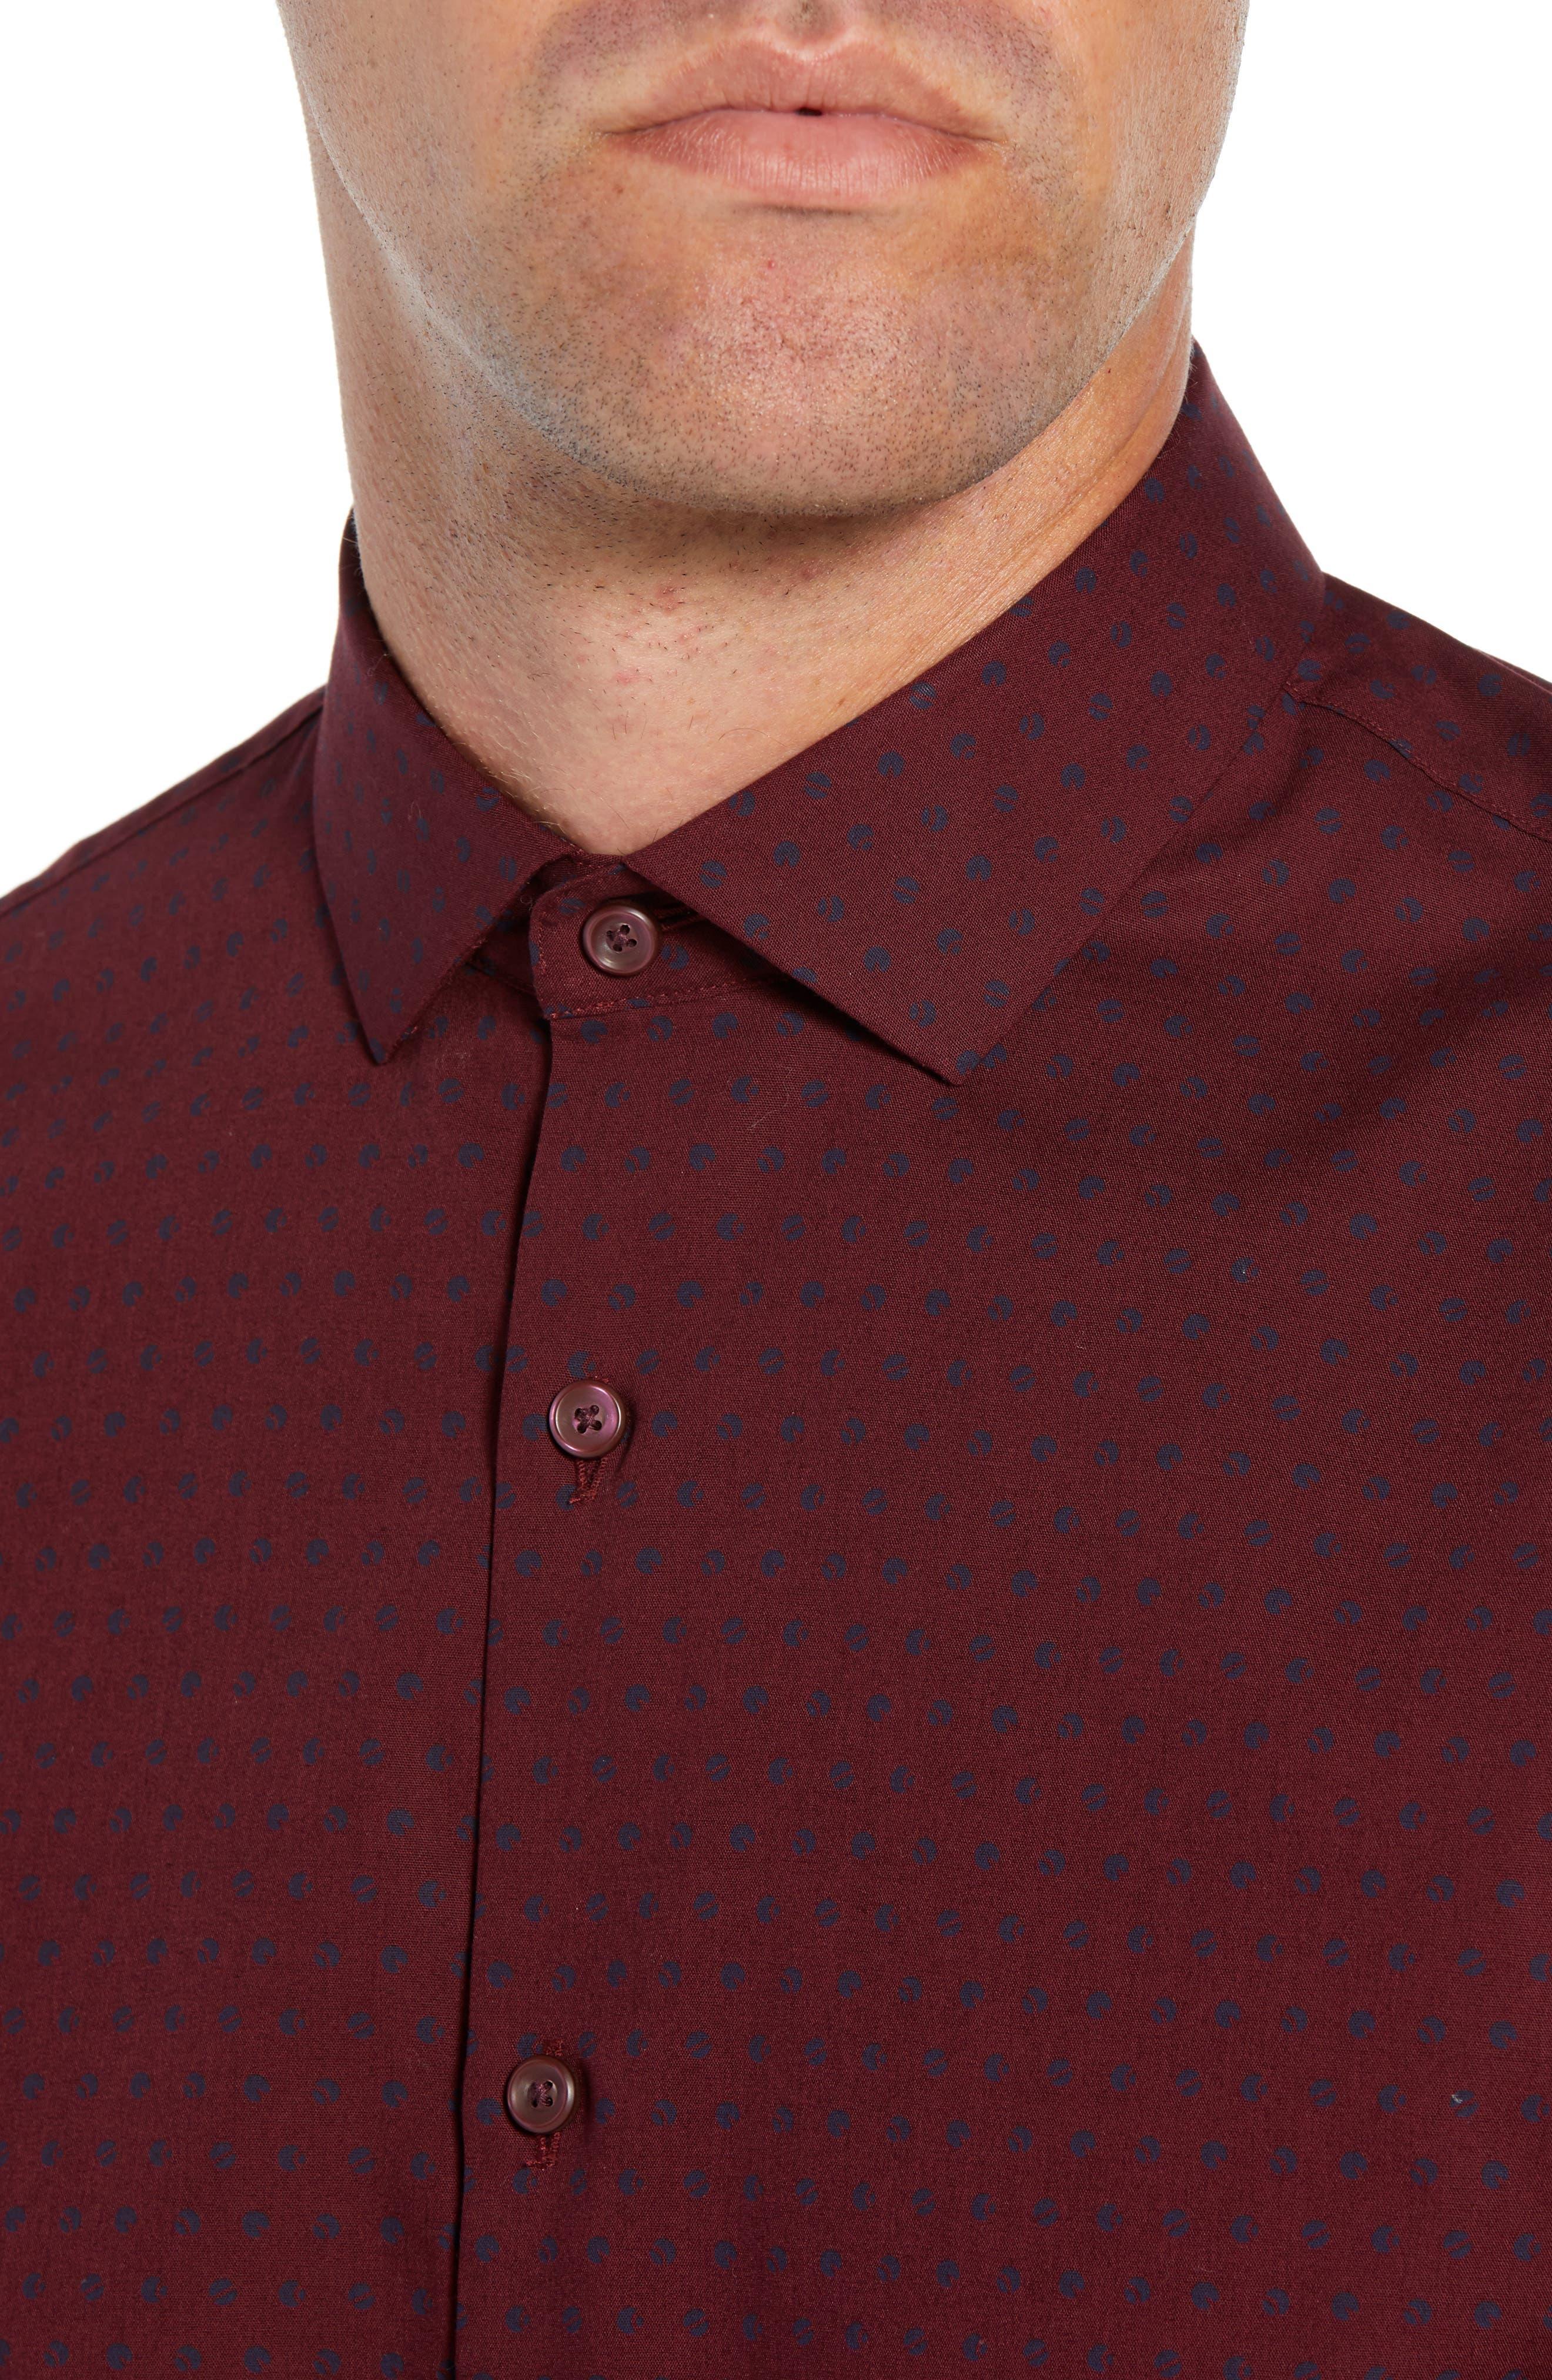 Slim Fit Non Iron Polka Dot Sport Shirt,                             Alternate thumbnail 2, color,                             BURGUNDY ROYALE NAVY DOT